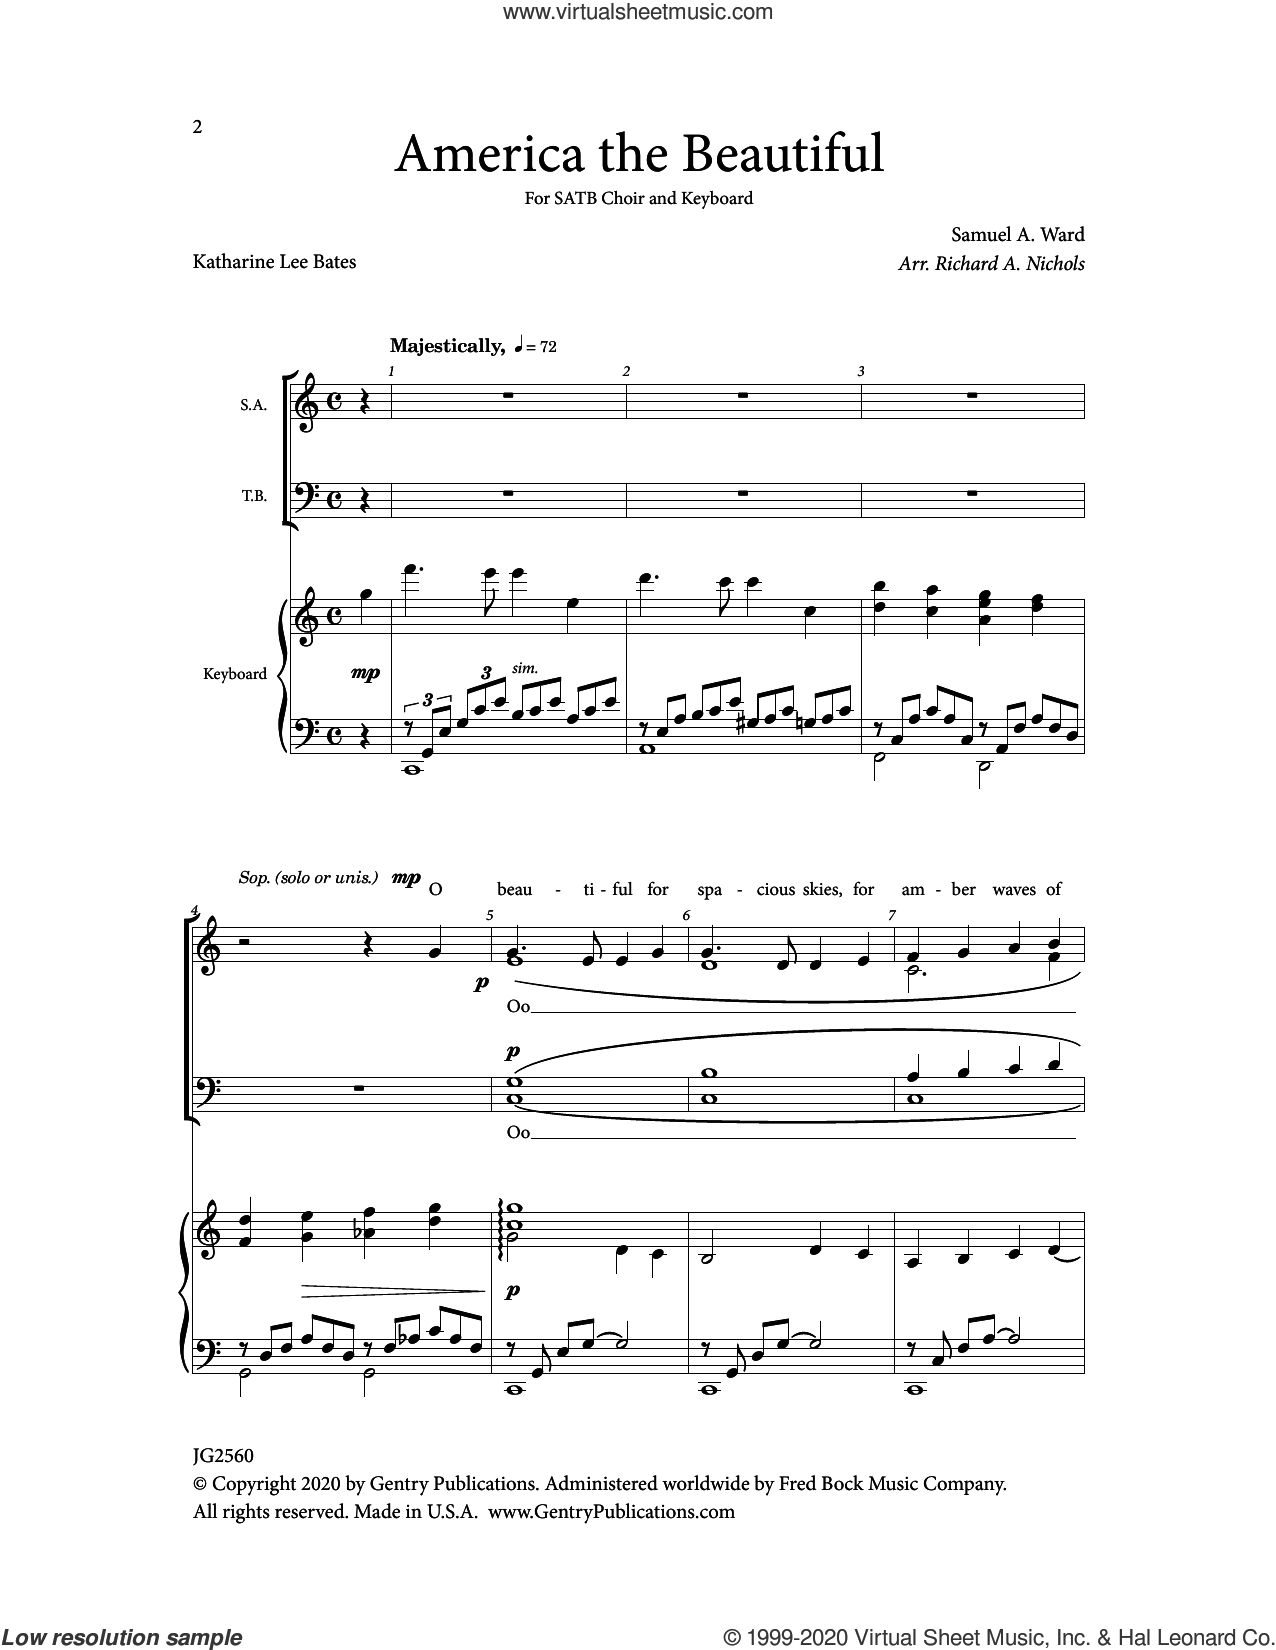 America The Beautiful sheet music for choir (SATB: soprano, alto, tenor, bass) by Samuel Augustus Ward and Richard Nichols, intermediate skill level